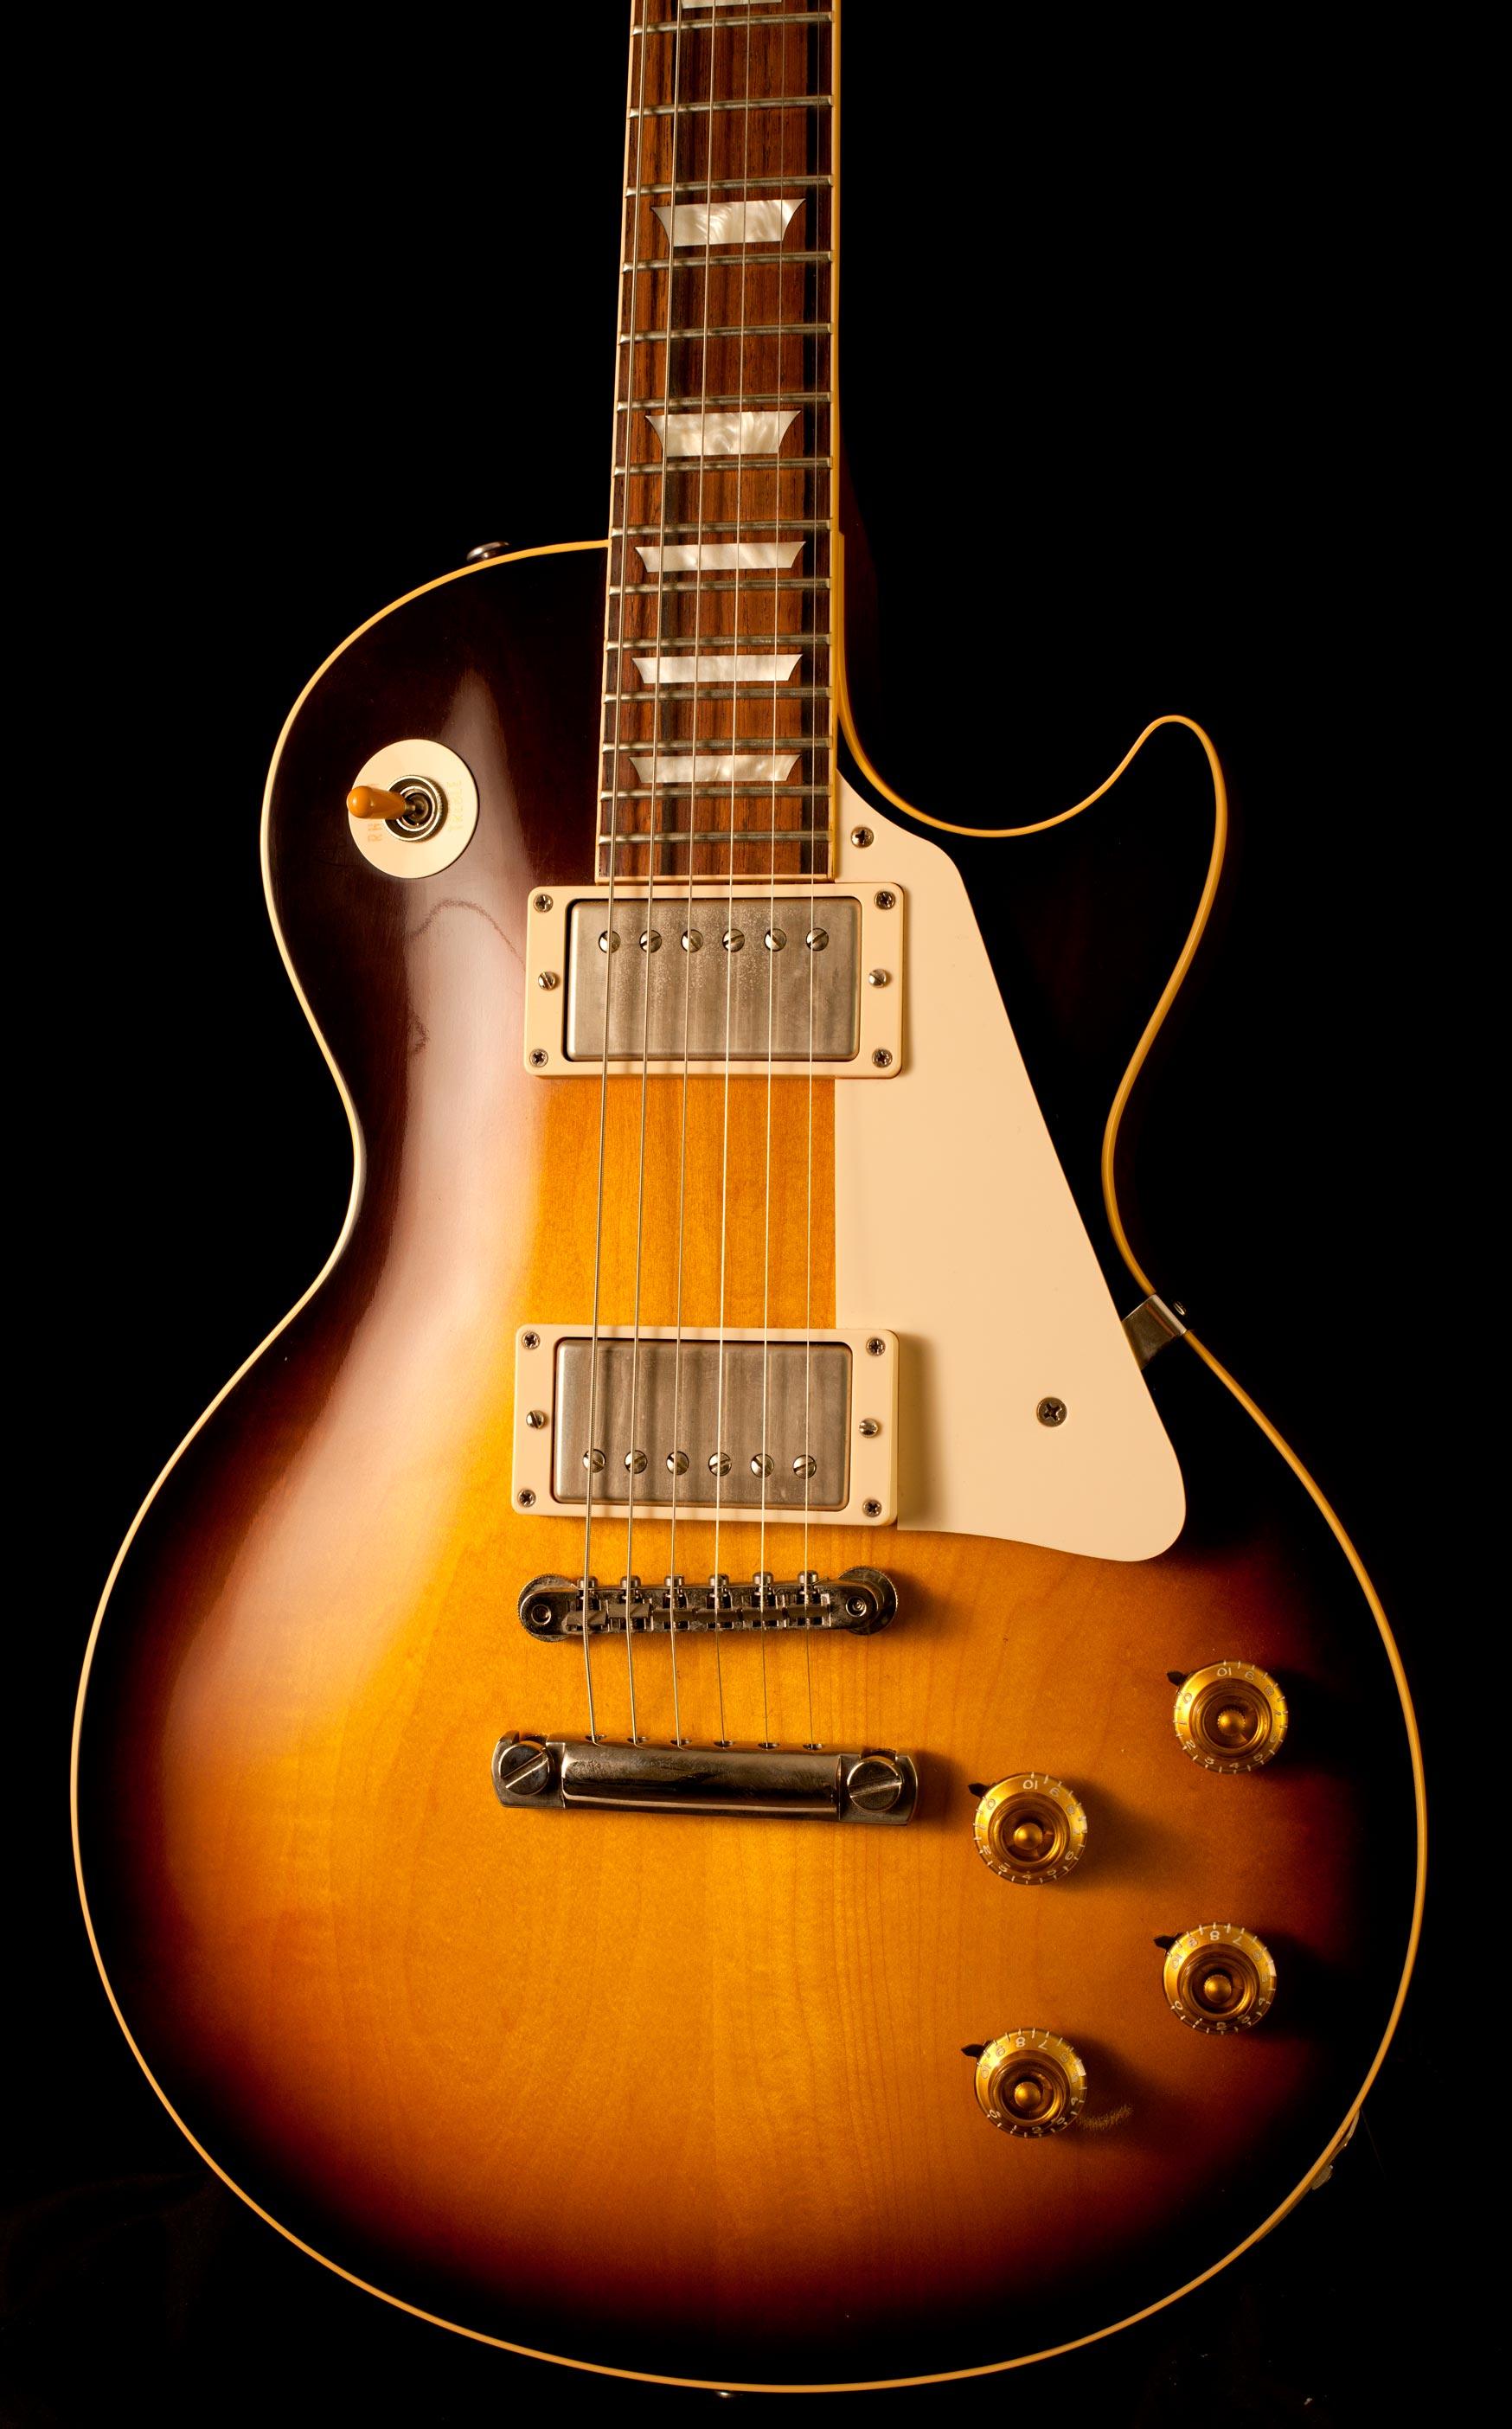 gibson les paul standard 1958 reissue 2014 faded tobacco guitar for sale gitarren total. Black Bedroom Furniture Sets. Home Design Ideas